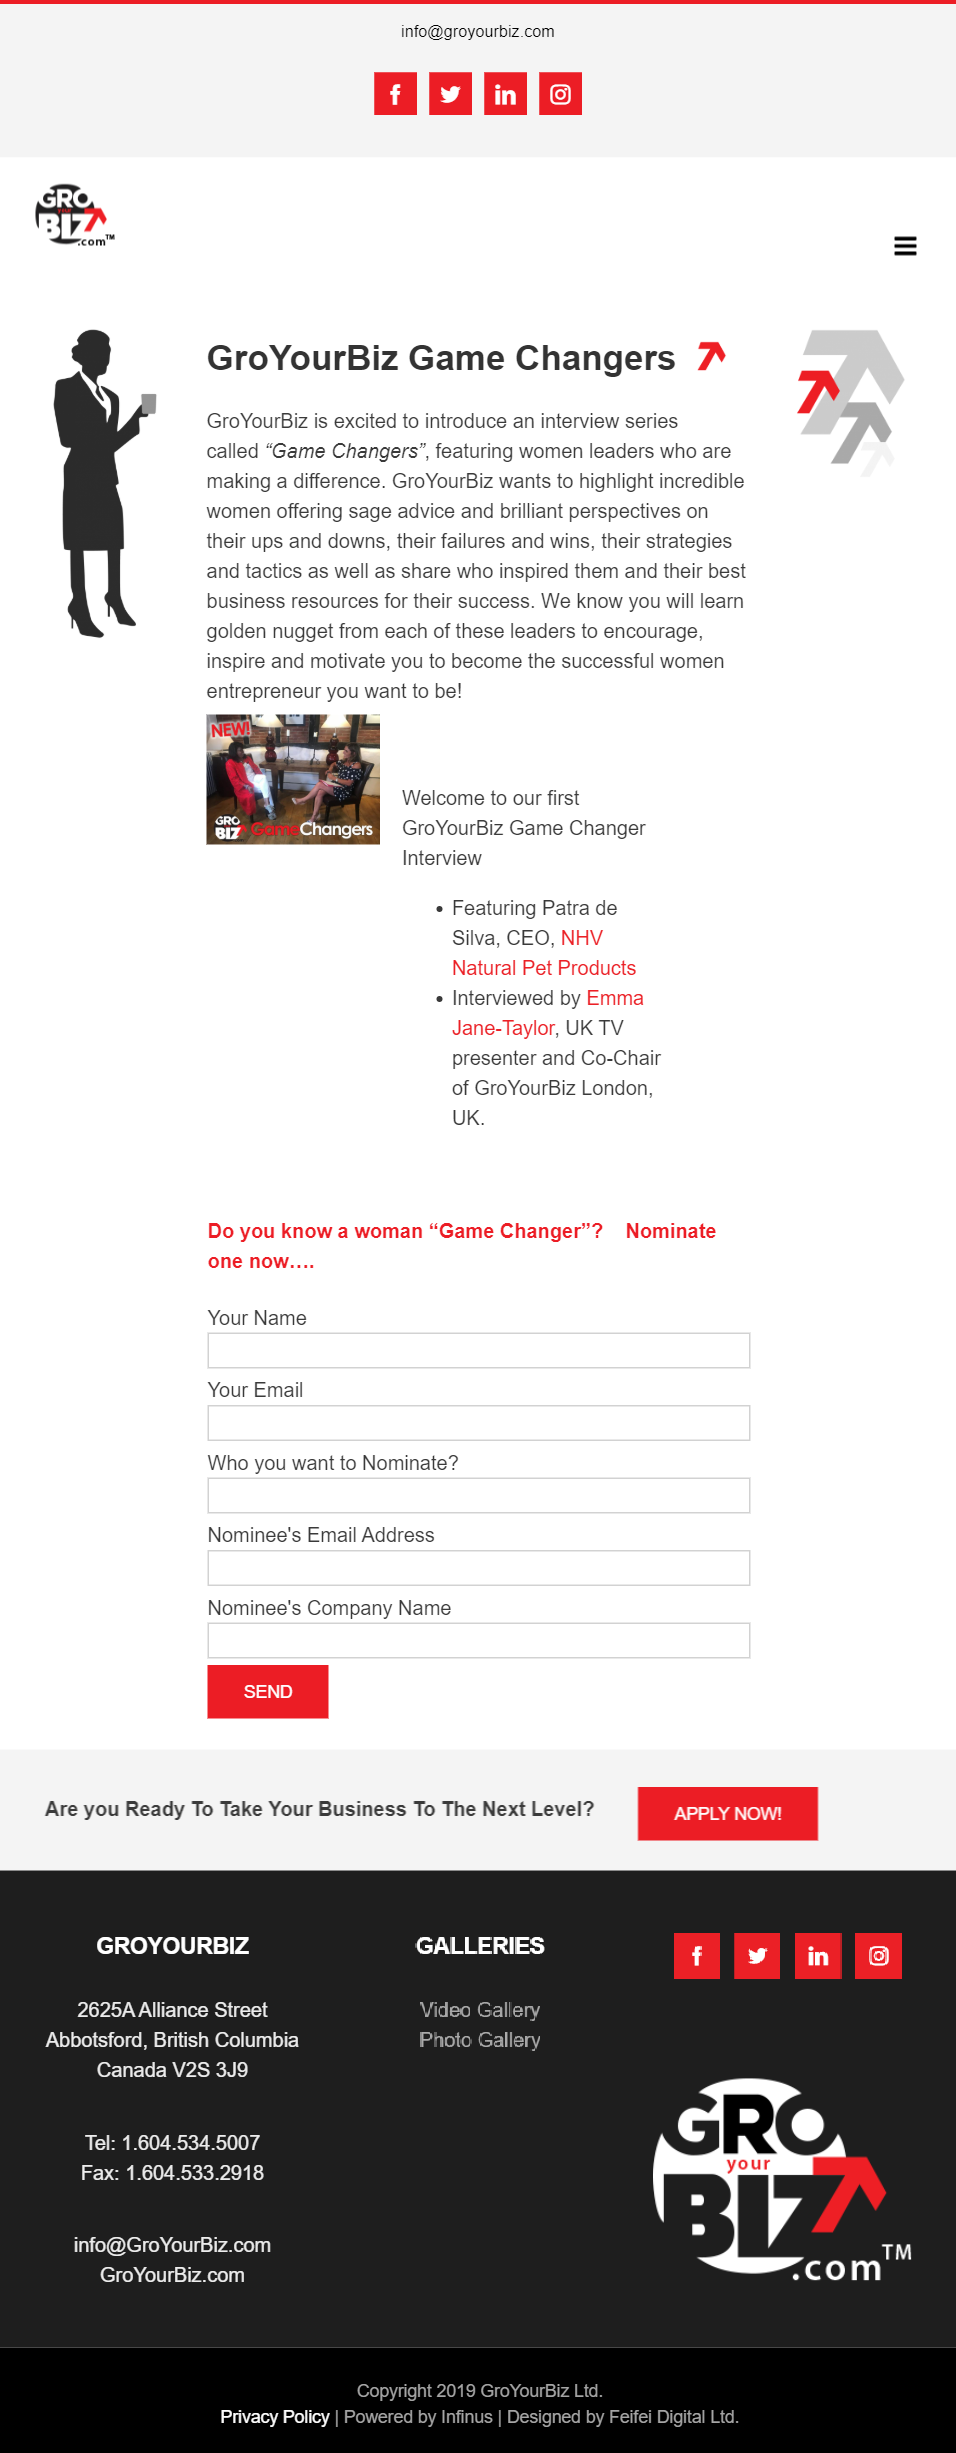 GroYourBiz Game Changers Page | User Interface and Front End Development | Feifei Digital | Monika Szucs